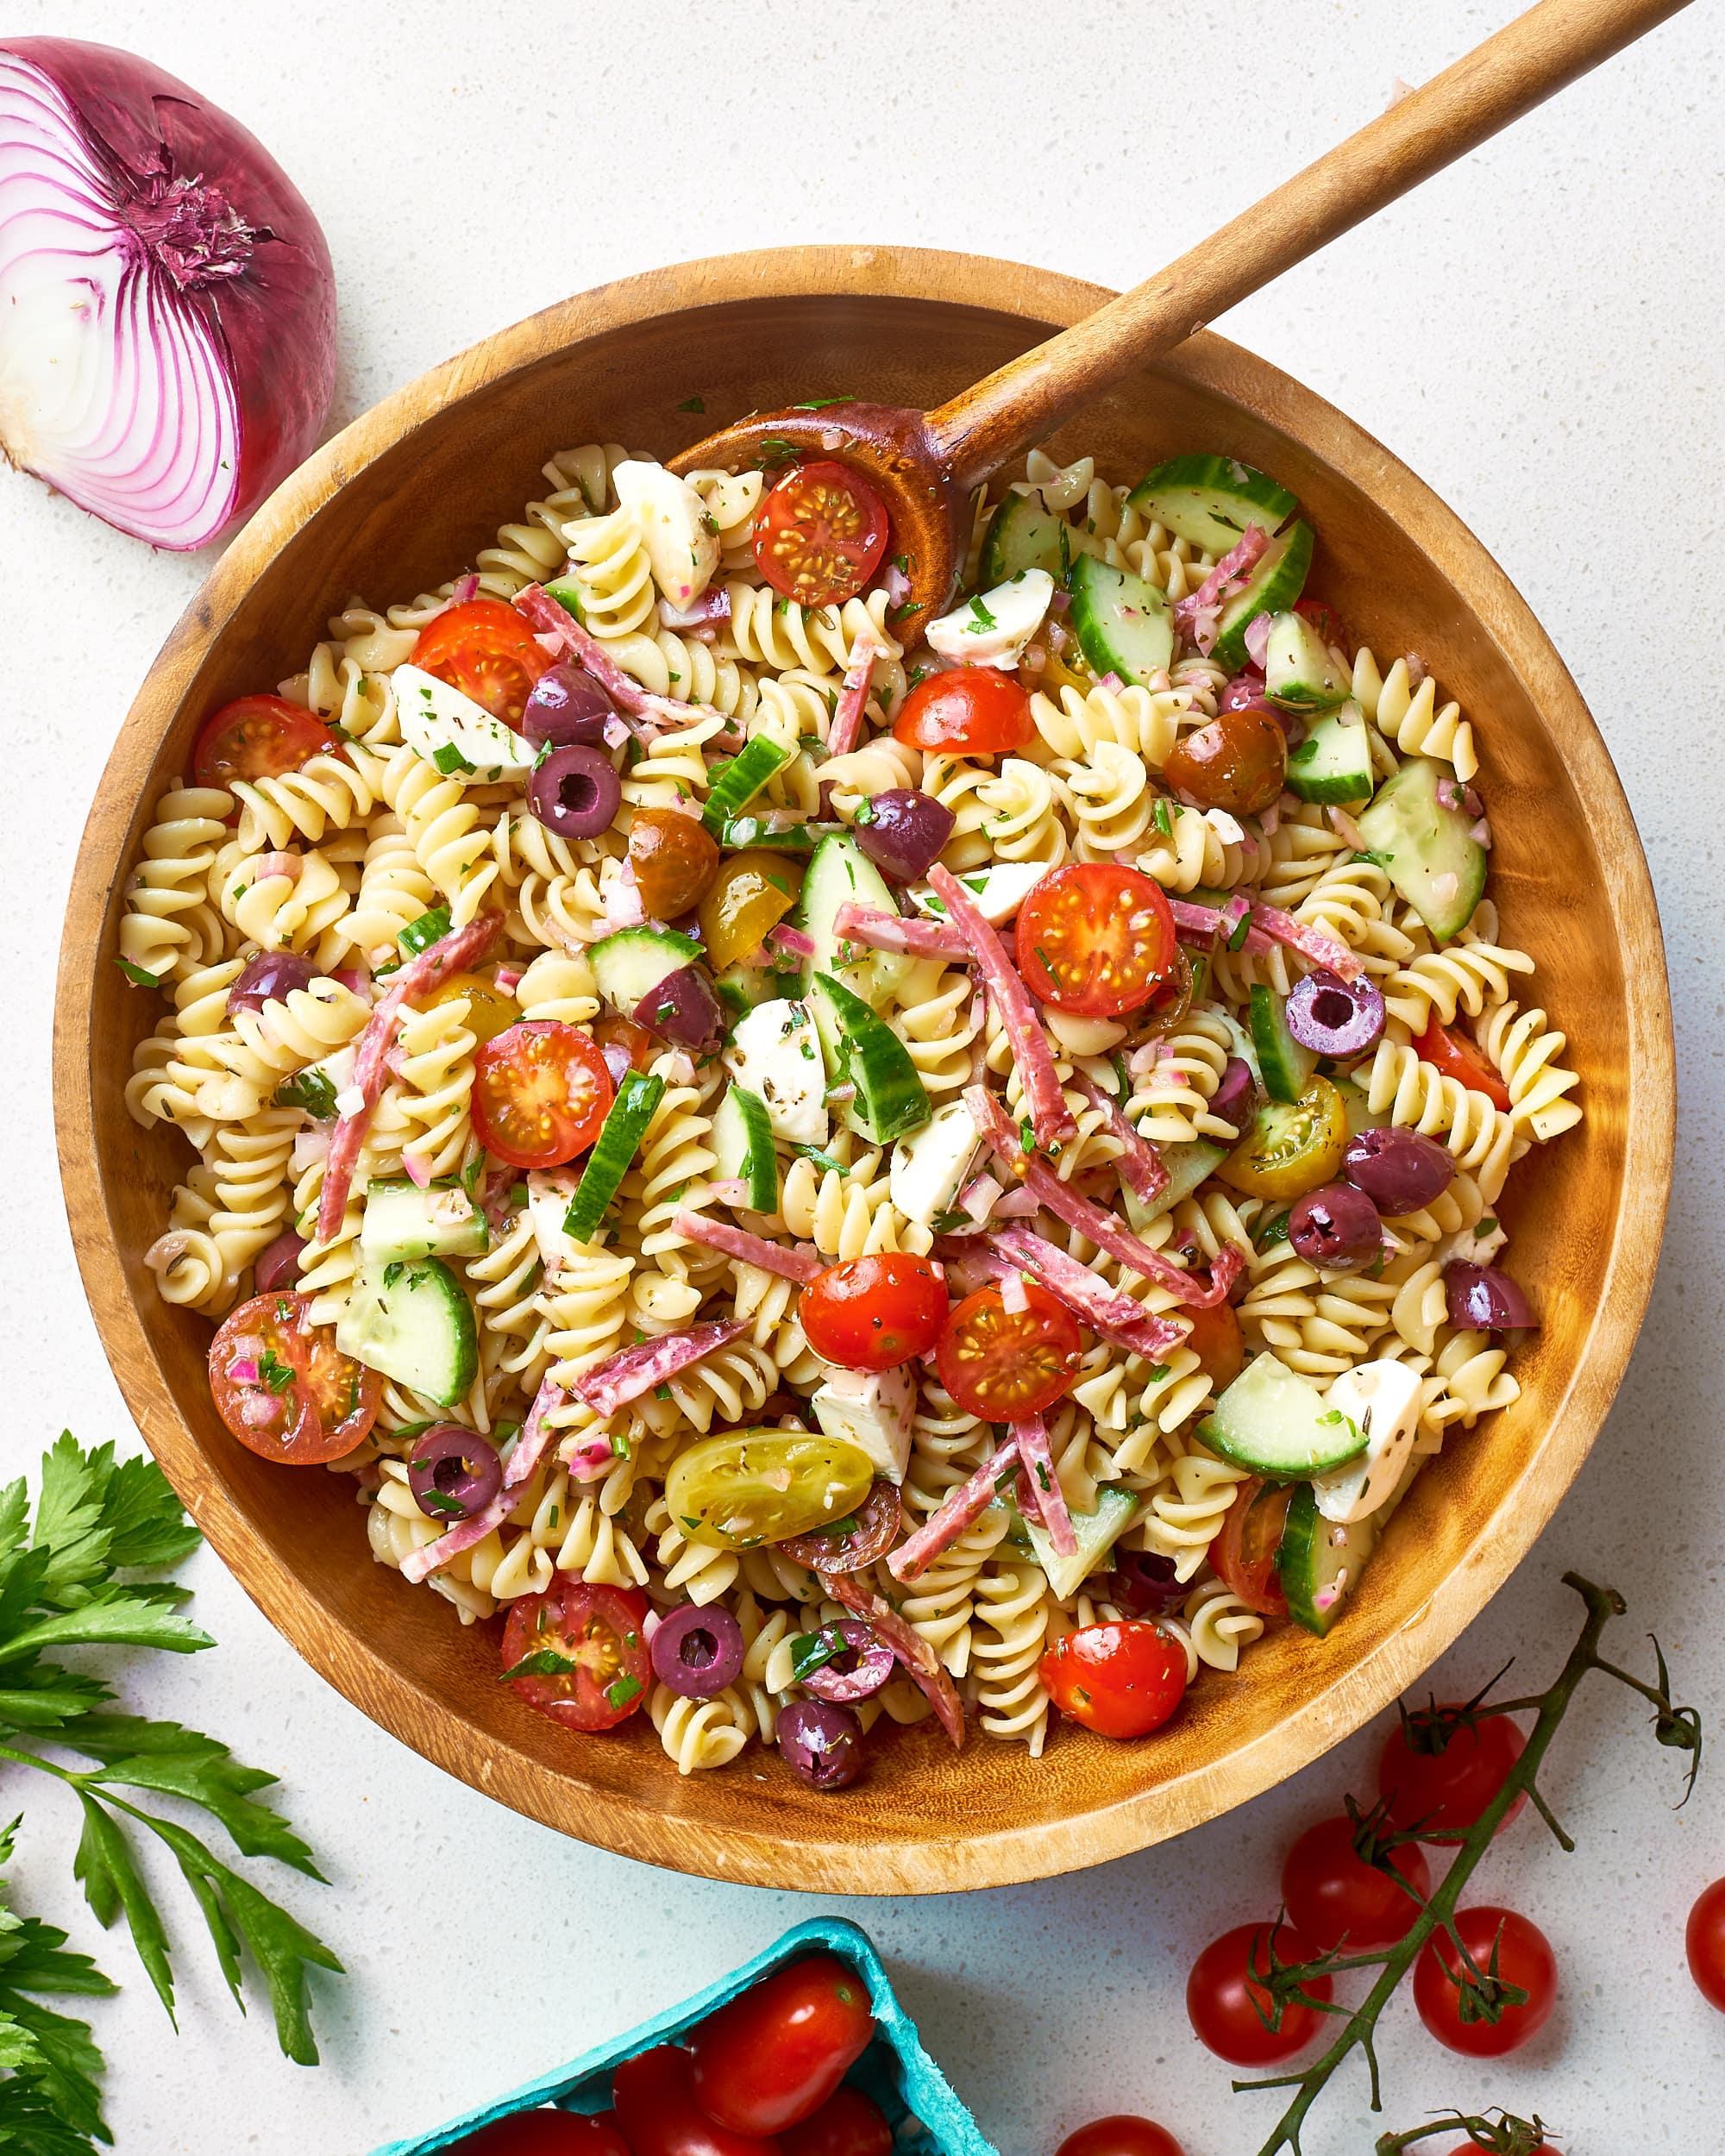 How To Make Easy Italian Pasta Salad